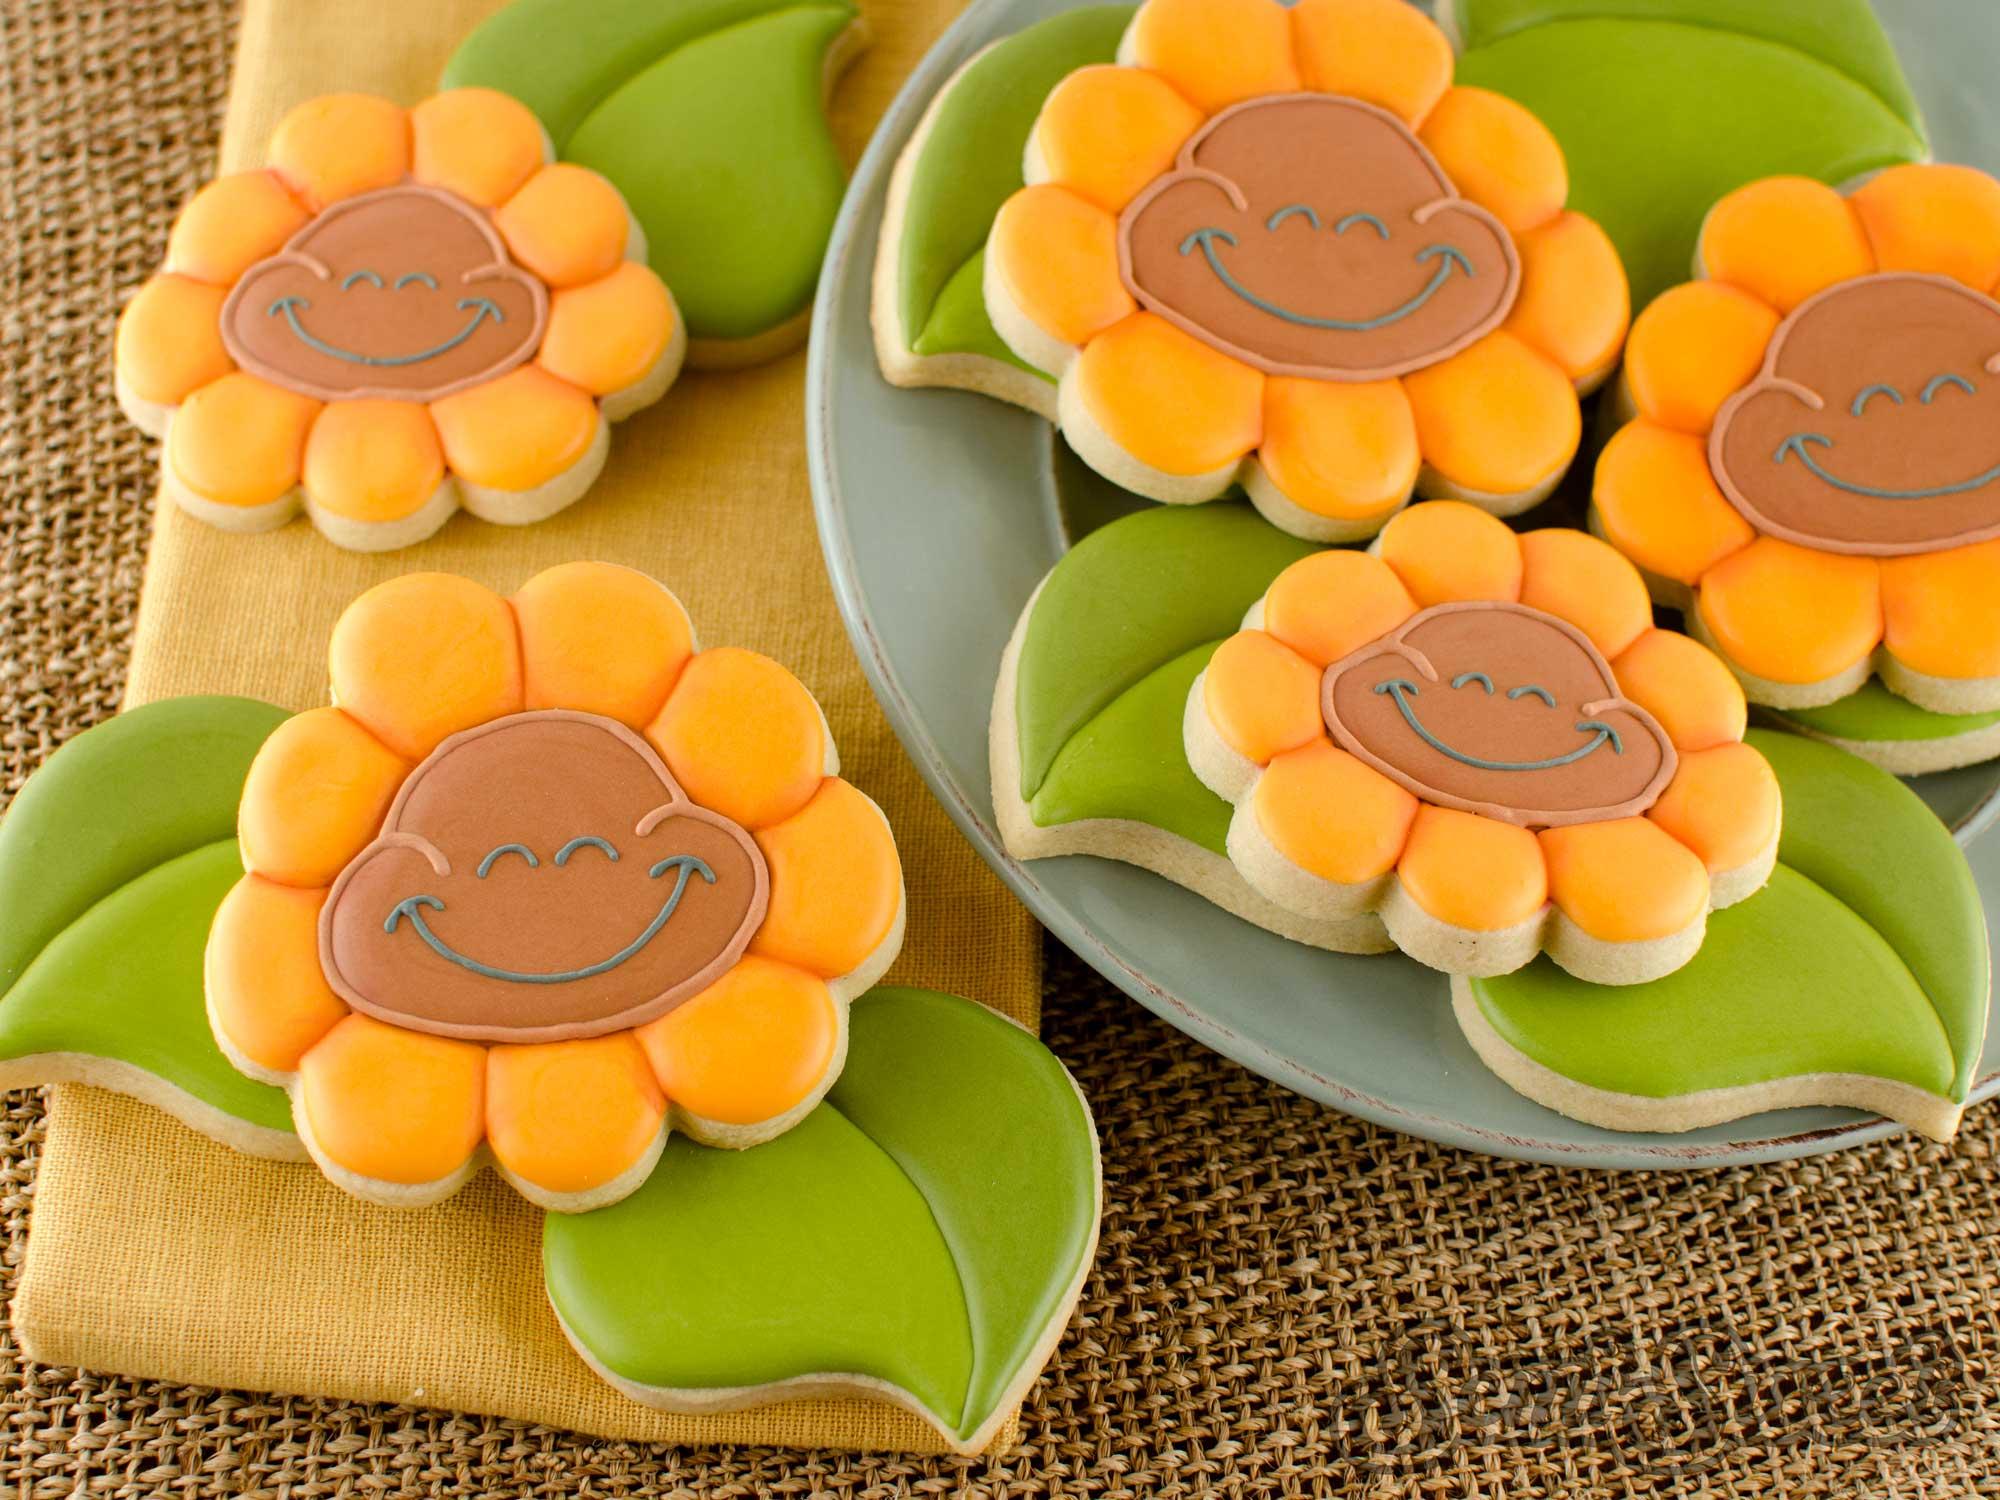 How to Make Cheeky Sunflower Cookies